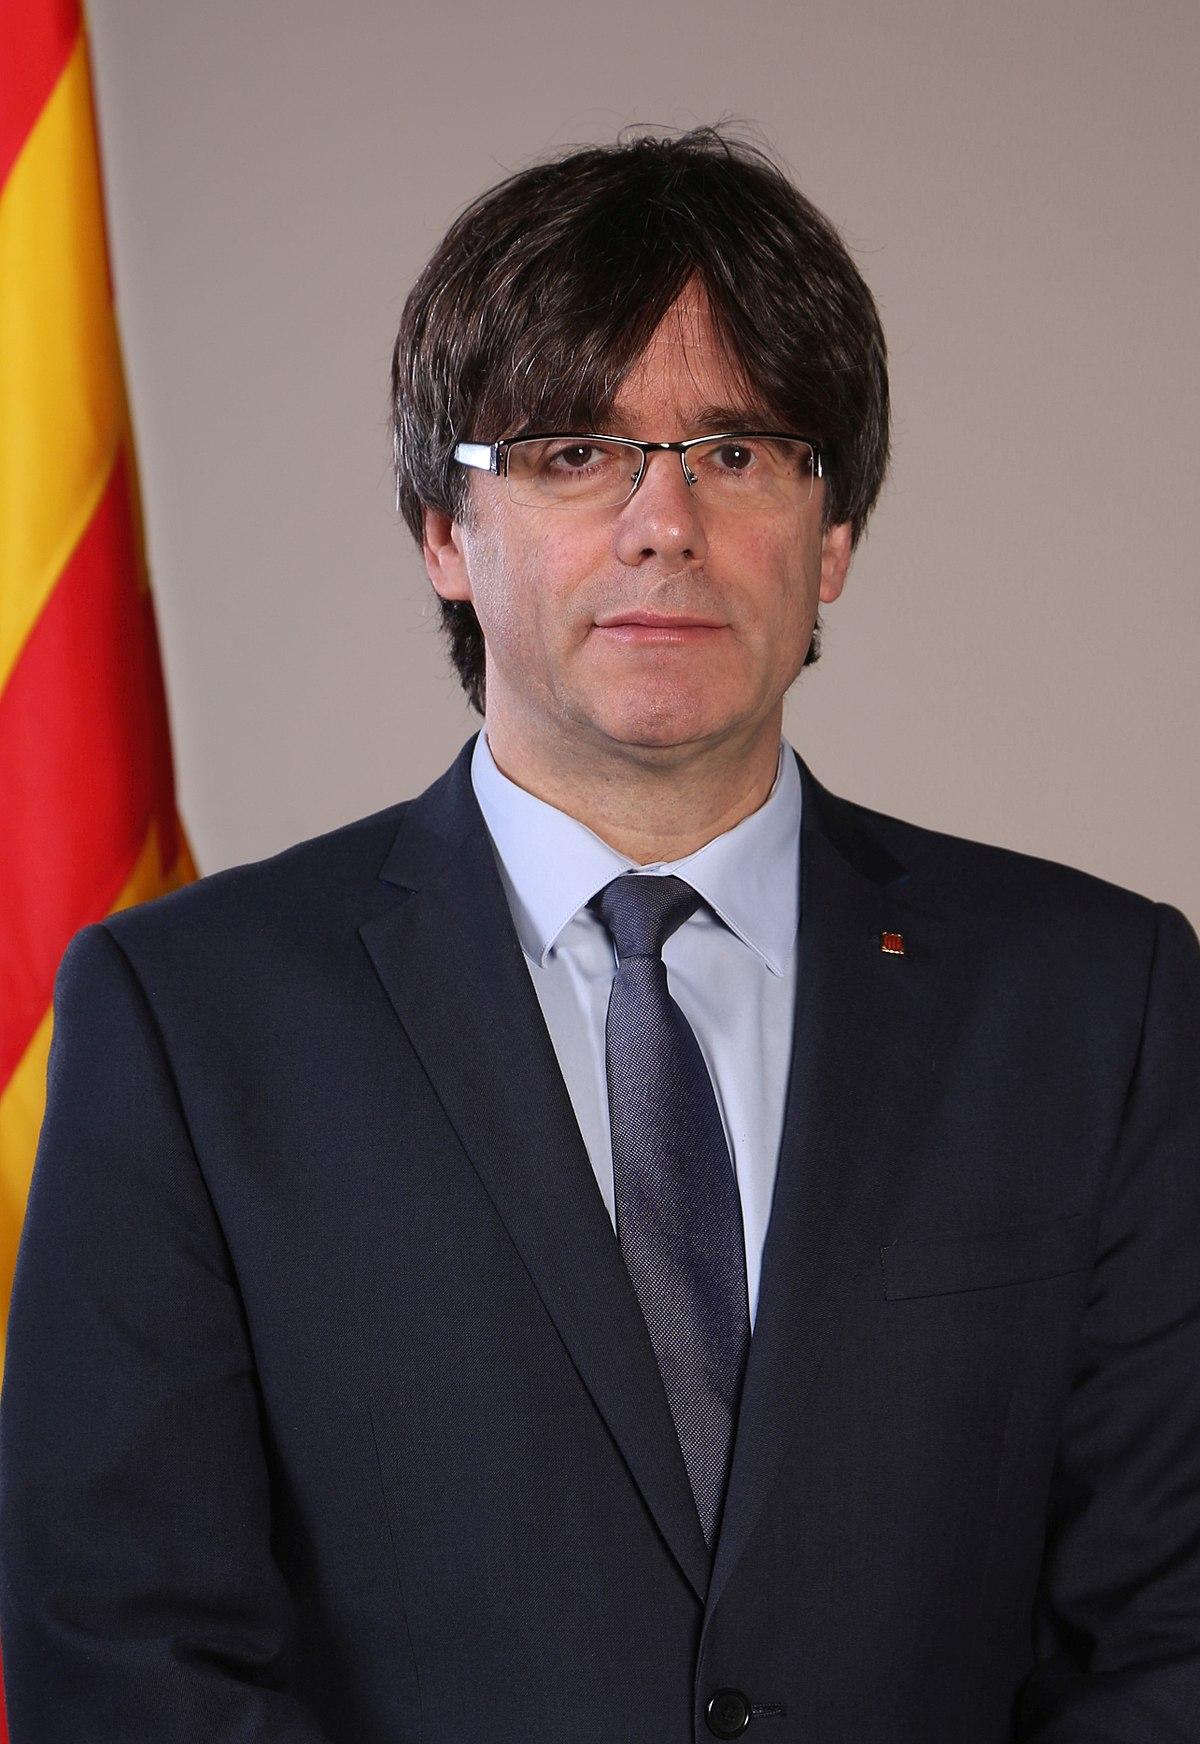 Carles Puigdemont - Wikipedia